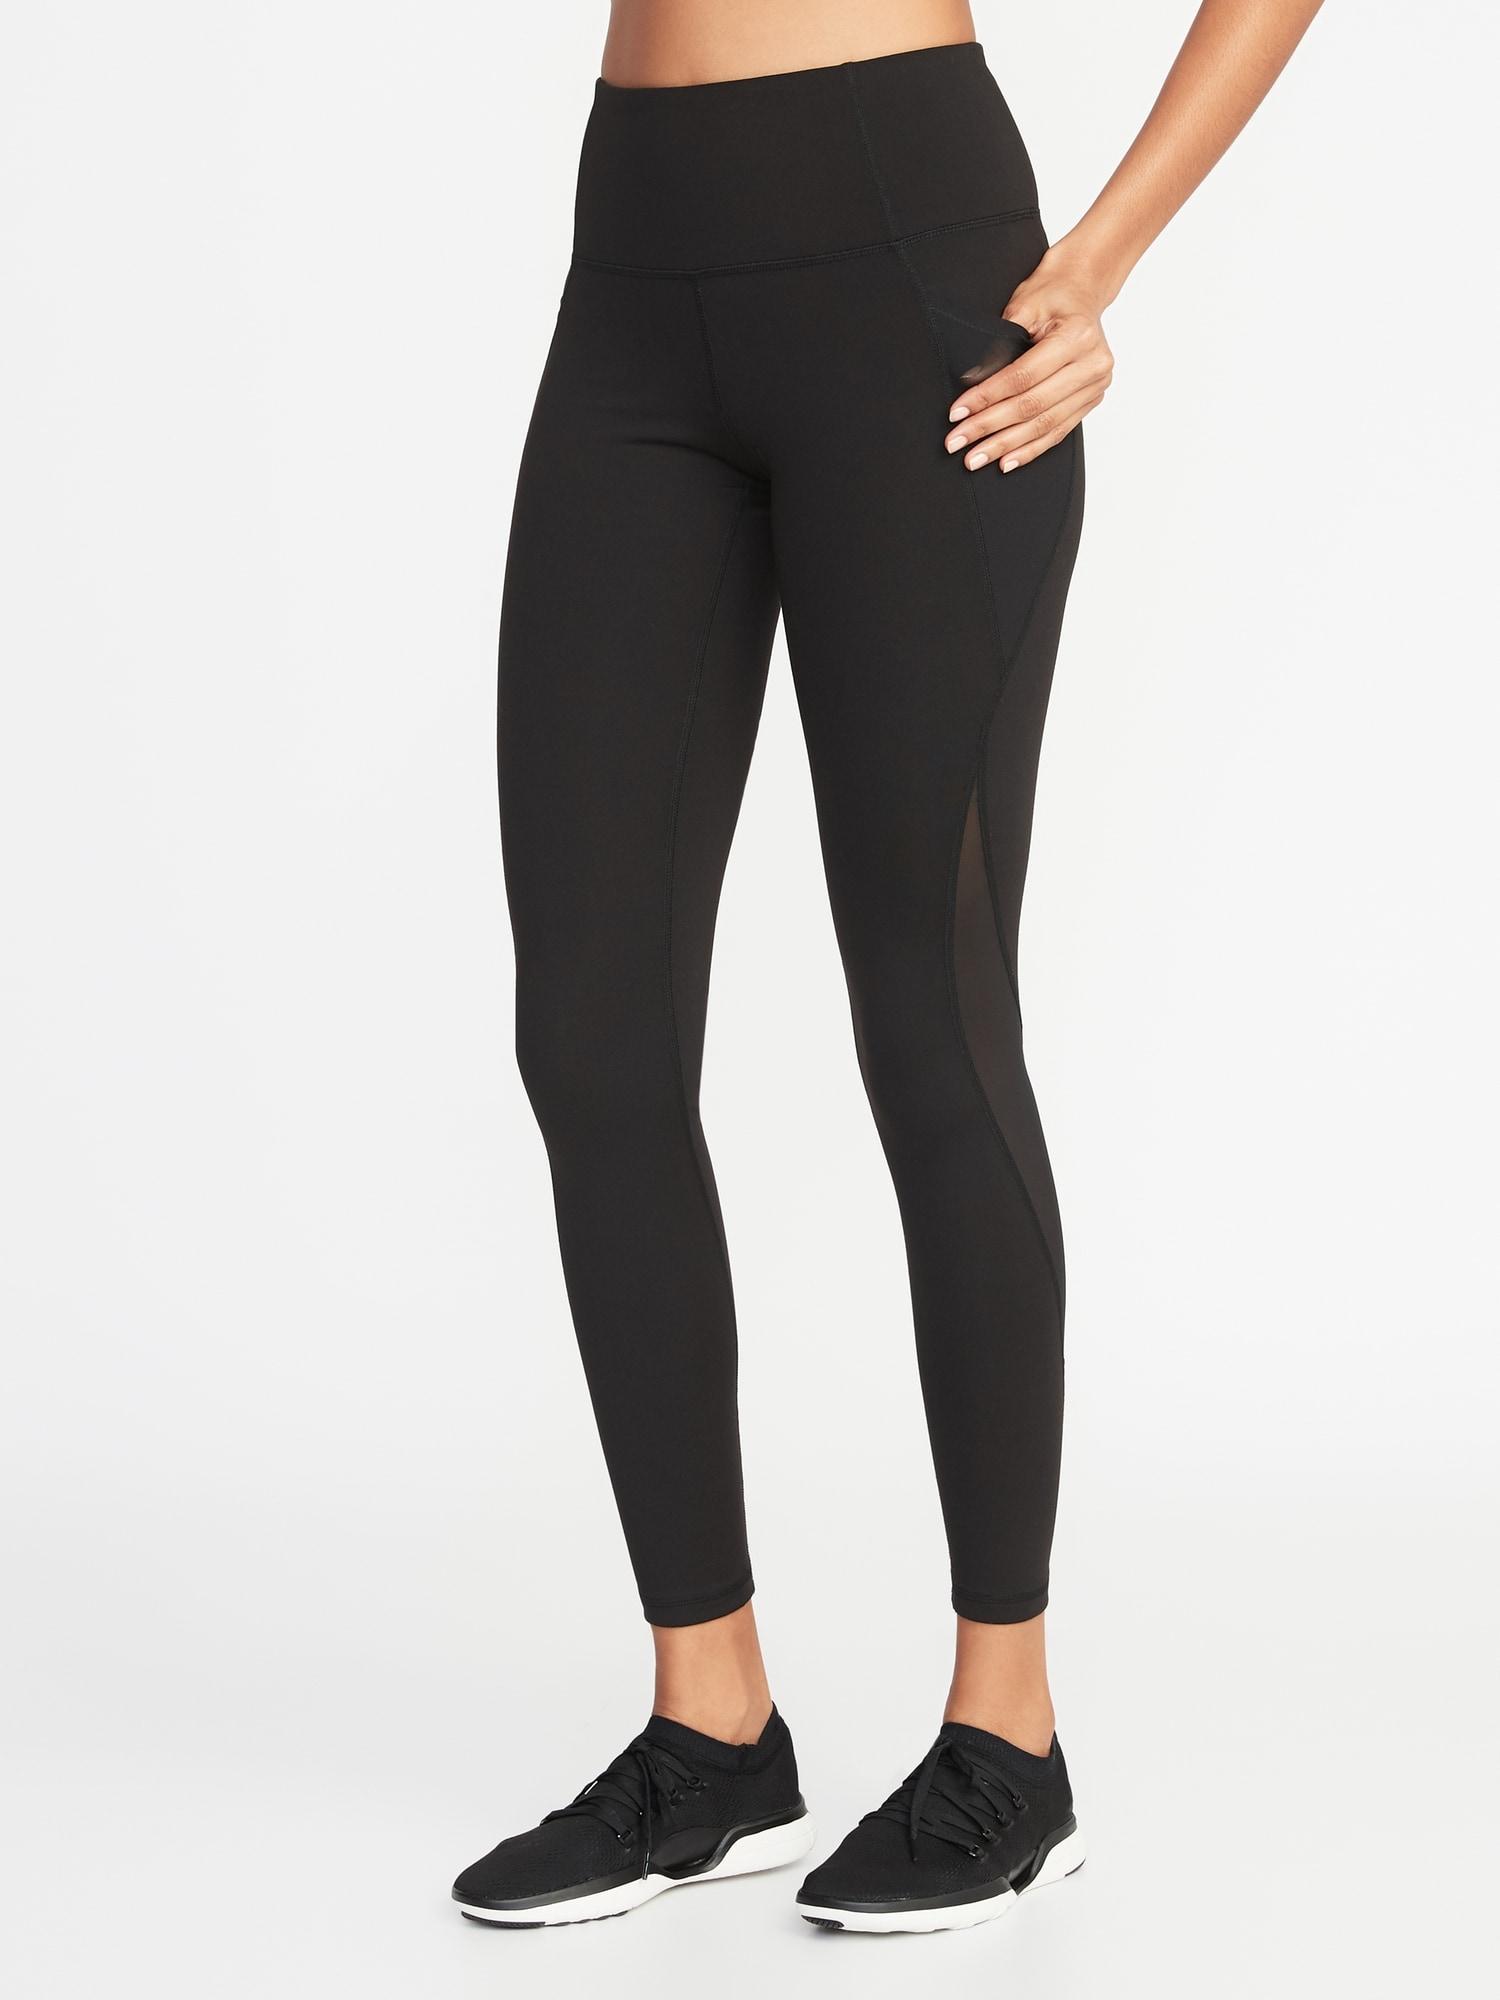 d5034ed739687d High-Rise Elevate Side-Pocket Mesh-Trim Compression Leggings for Women